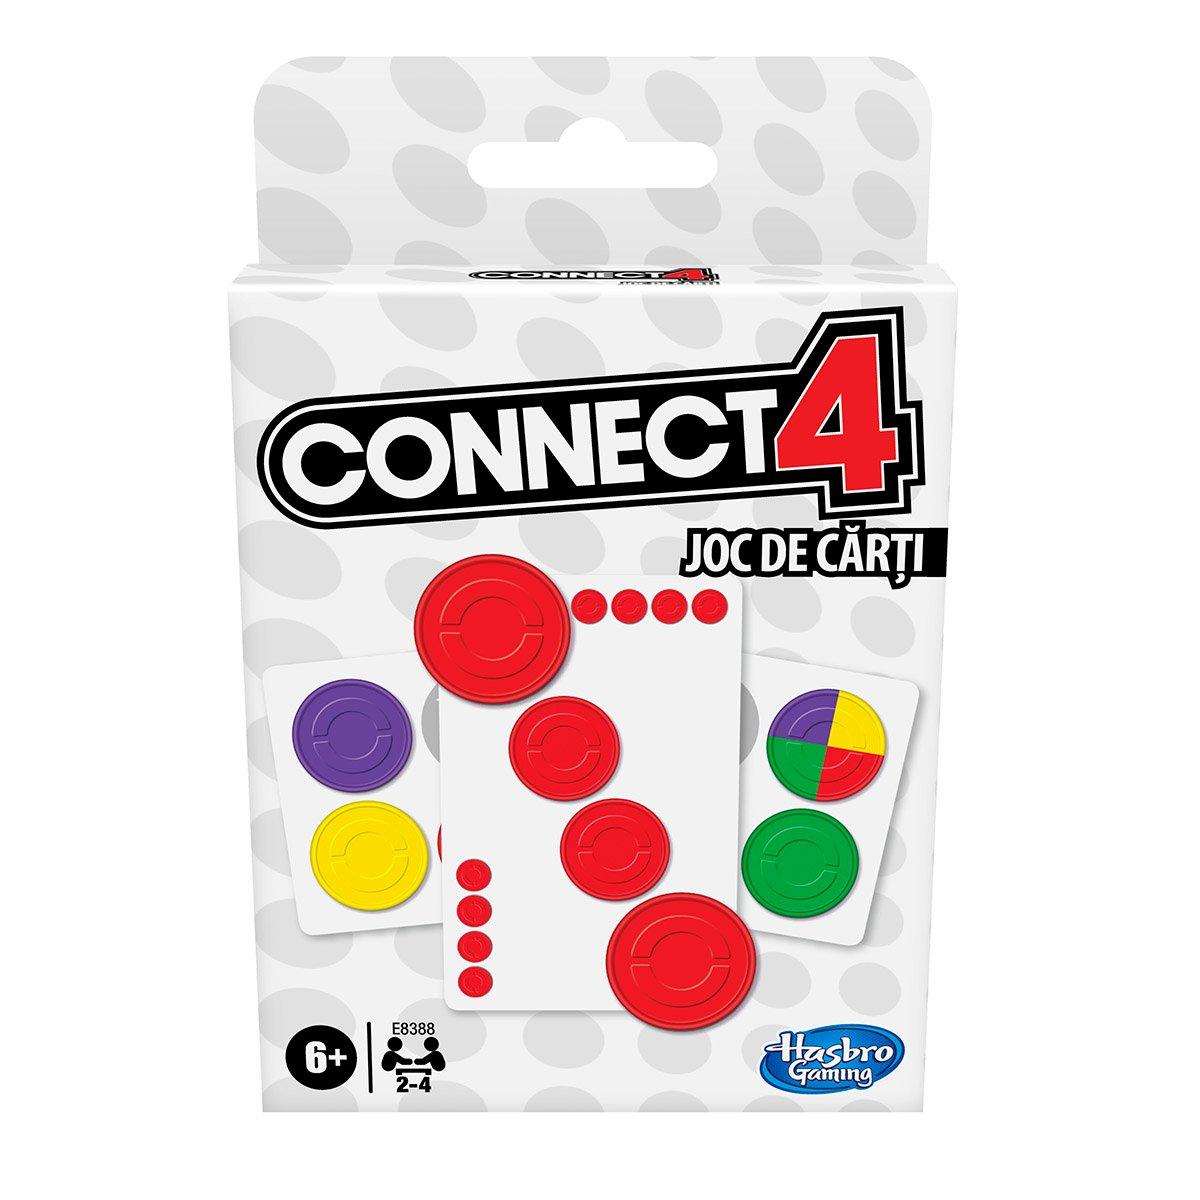 Joc de carti Hasbro Connect4